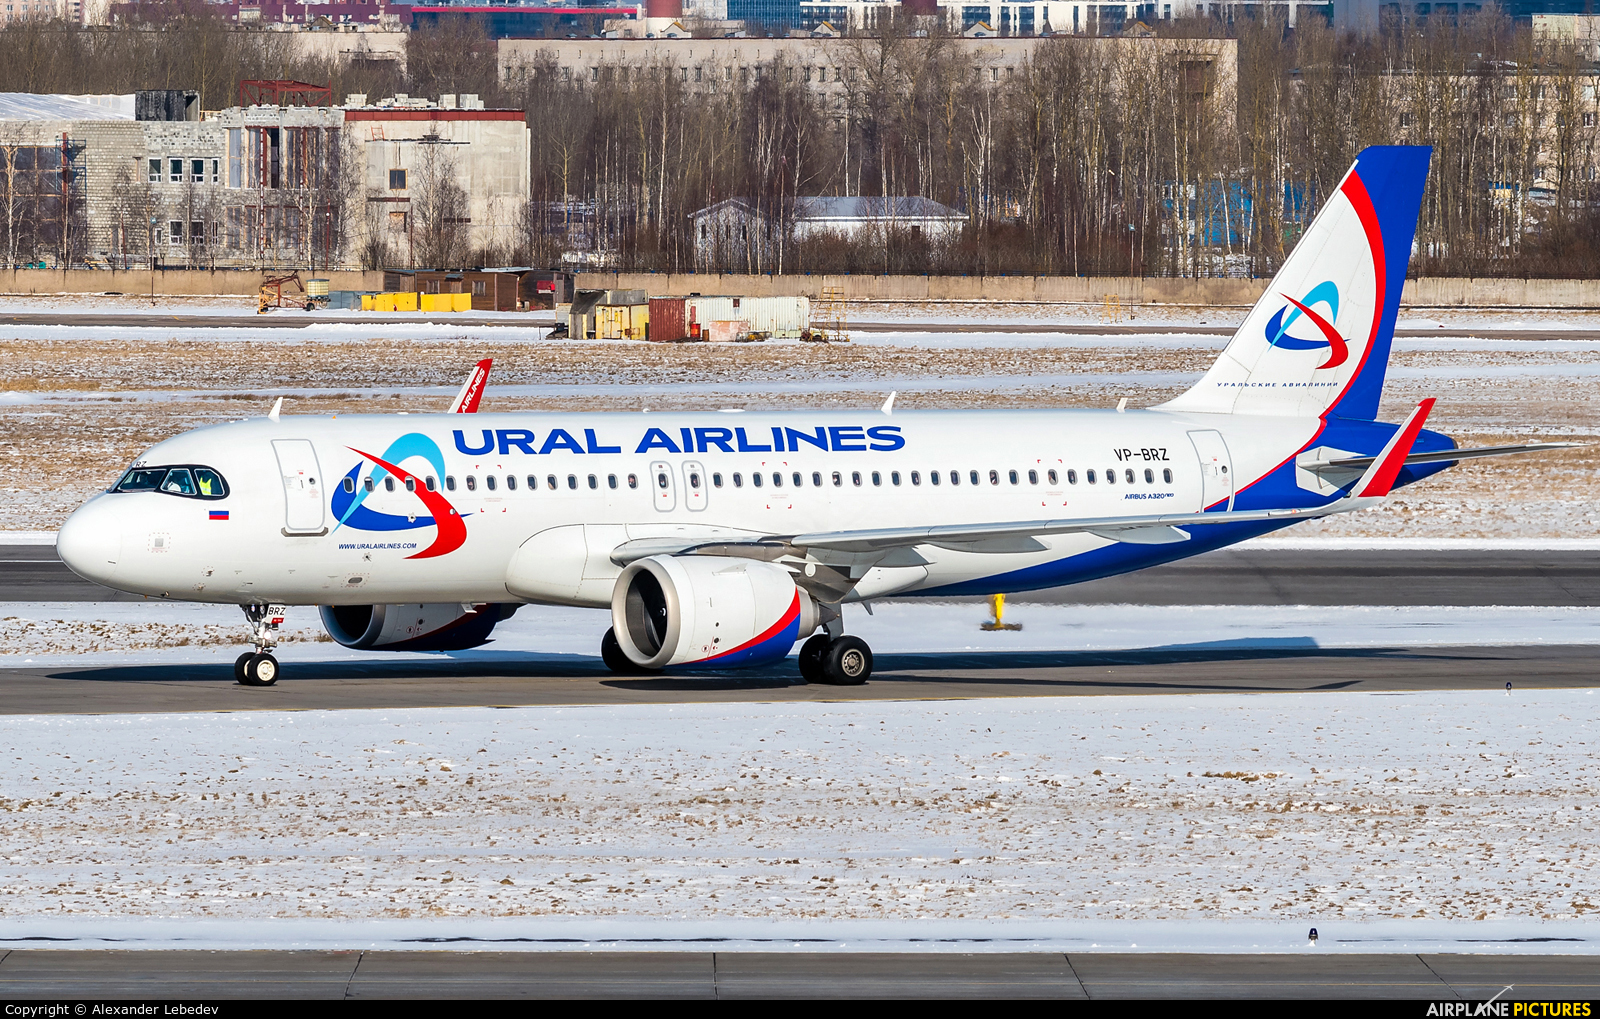 Ural Airlines VP-BRZ aircraft at St. Petersburg - Pulkovo